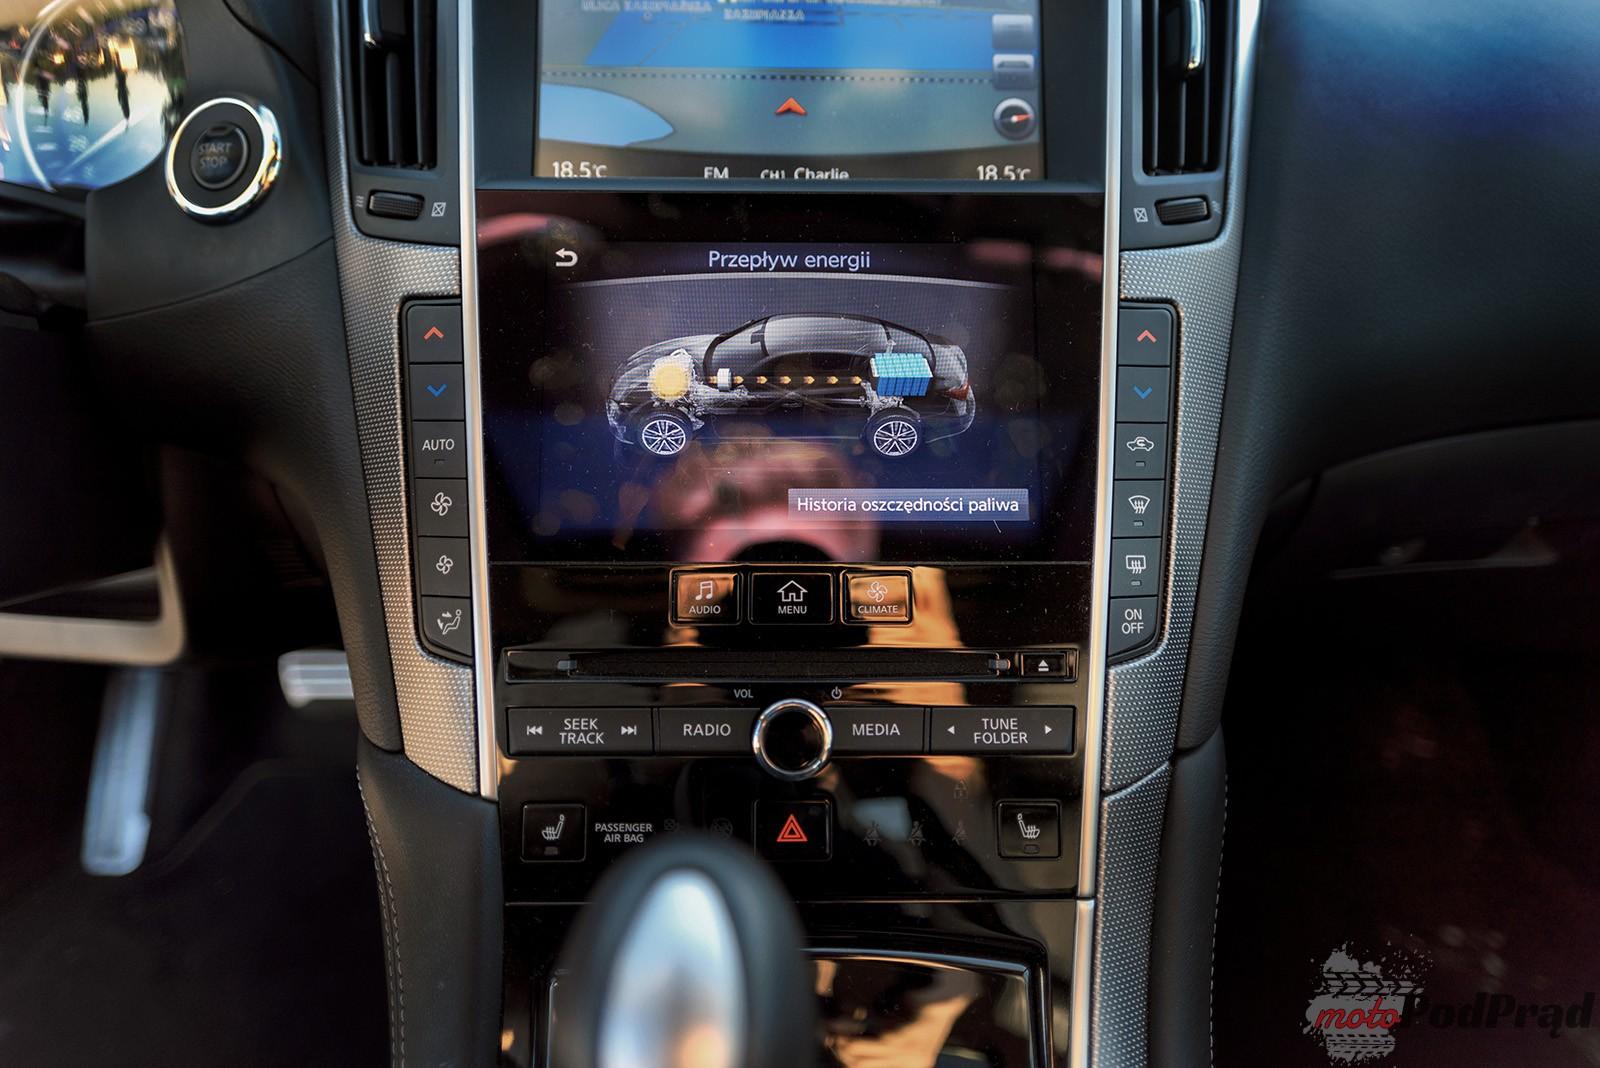 Infiniti Q50 17 Test: Infiniti Q50 S Hybrid   nie tylko Europa